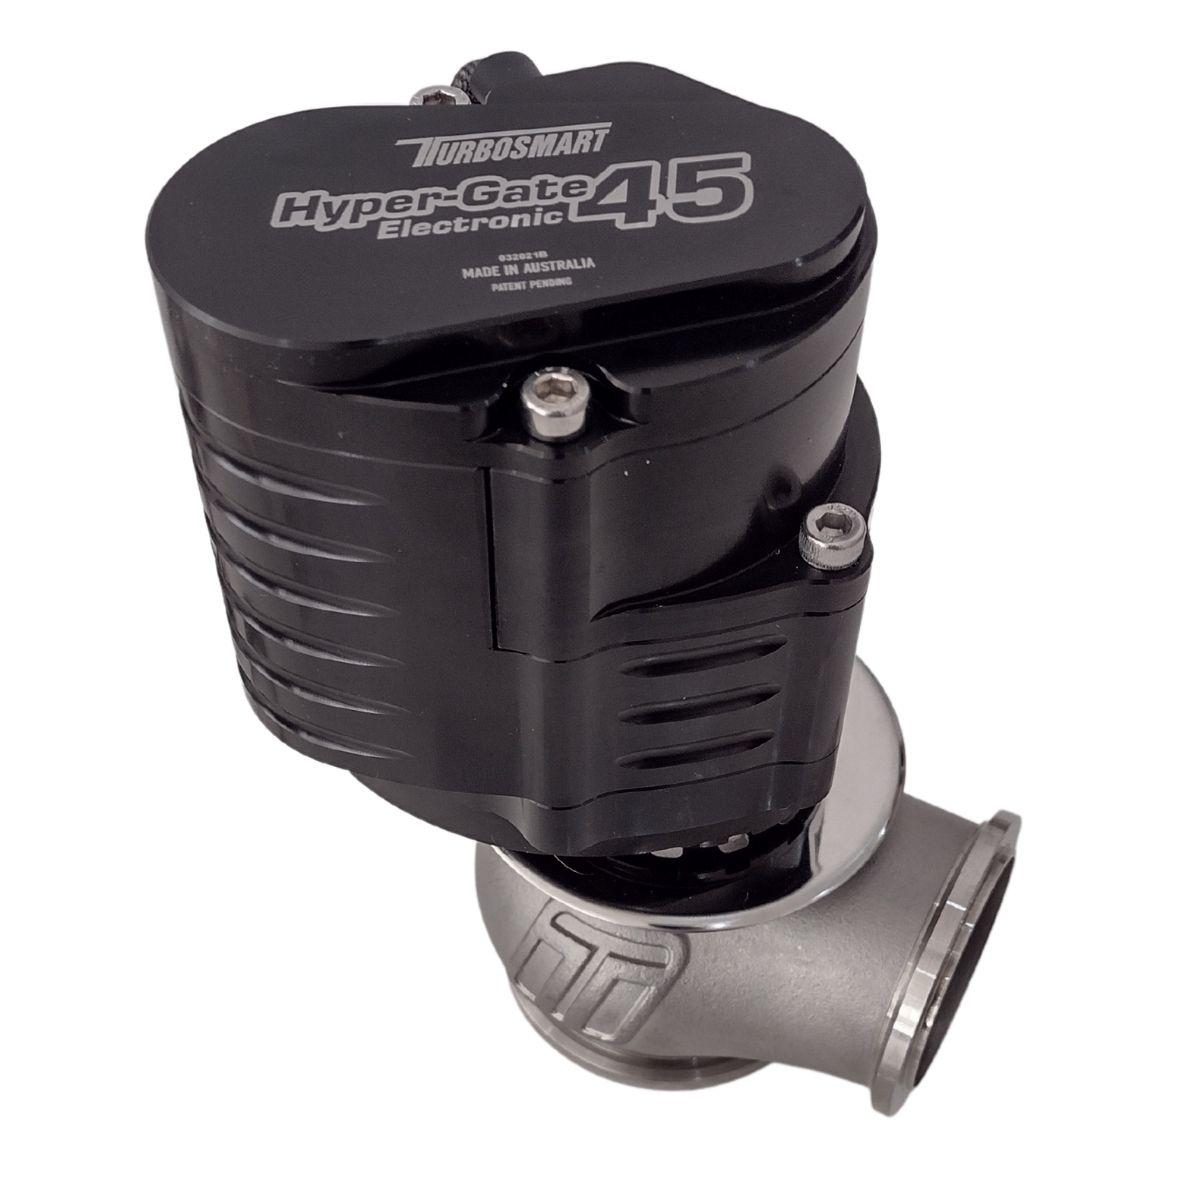 Wastegate Eletrônica Hypergate 45 Turbosmart + Driver Fueltech